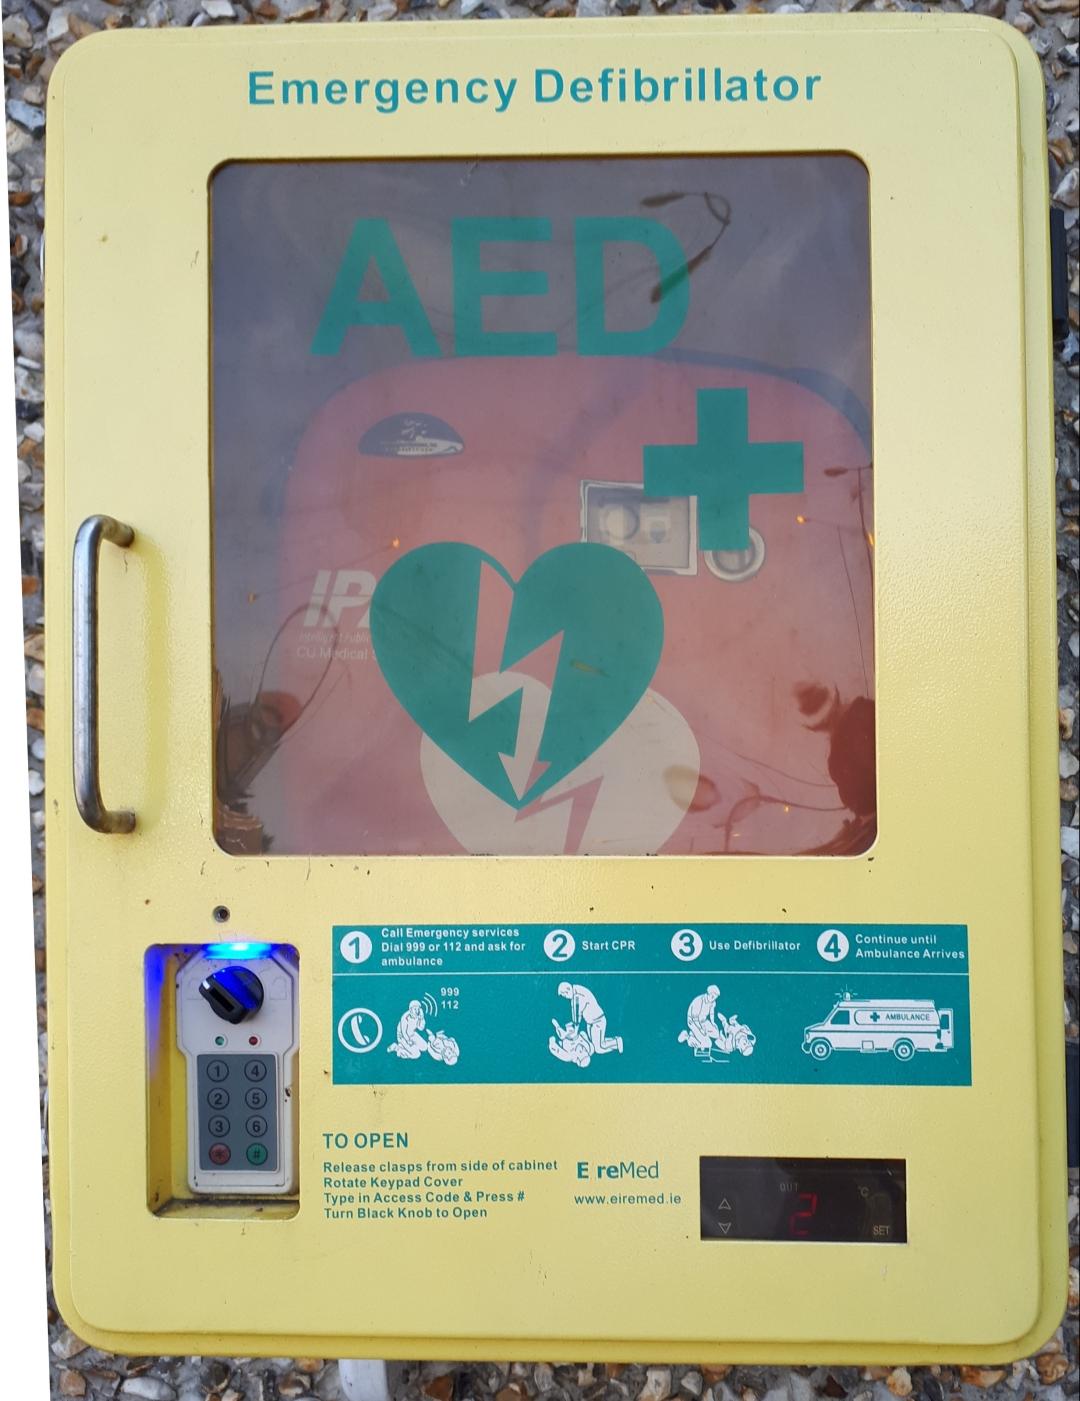 Defibrillator in Goff's Oak Village instructions